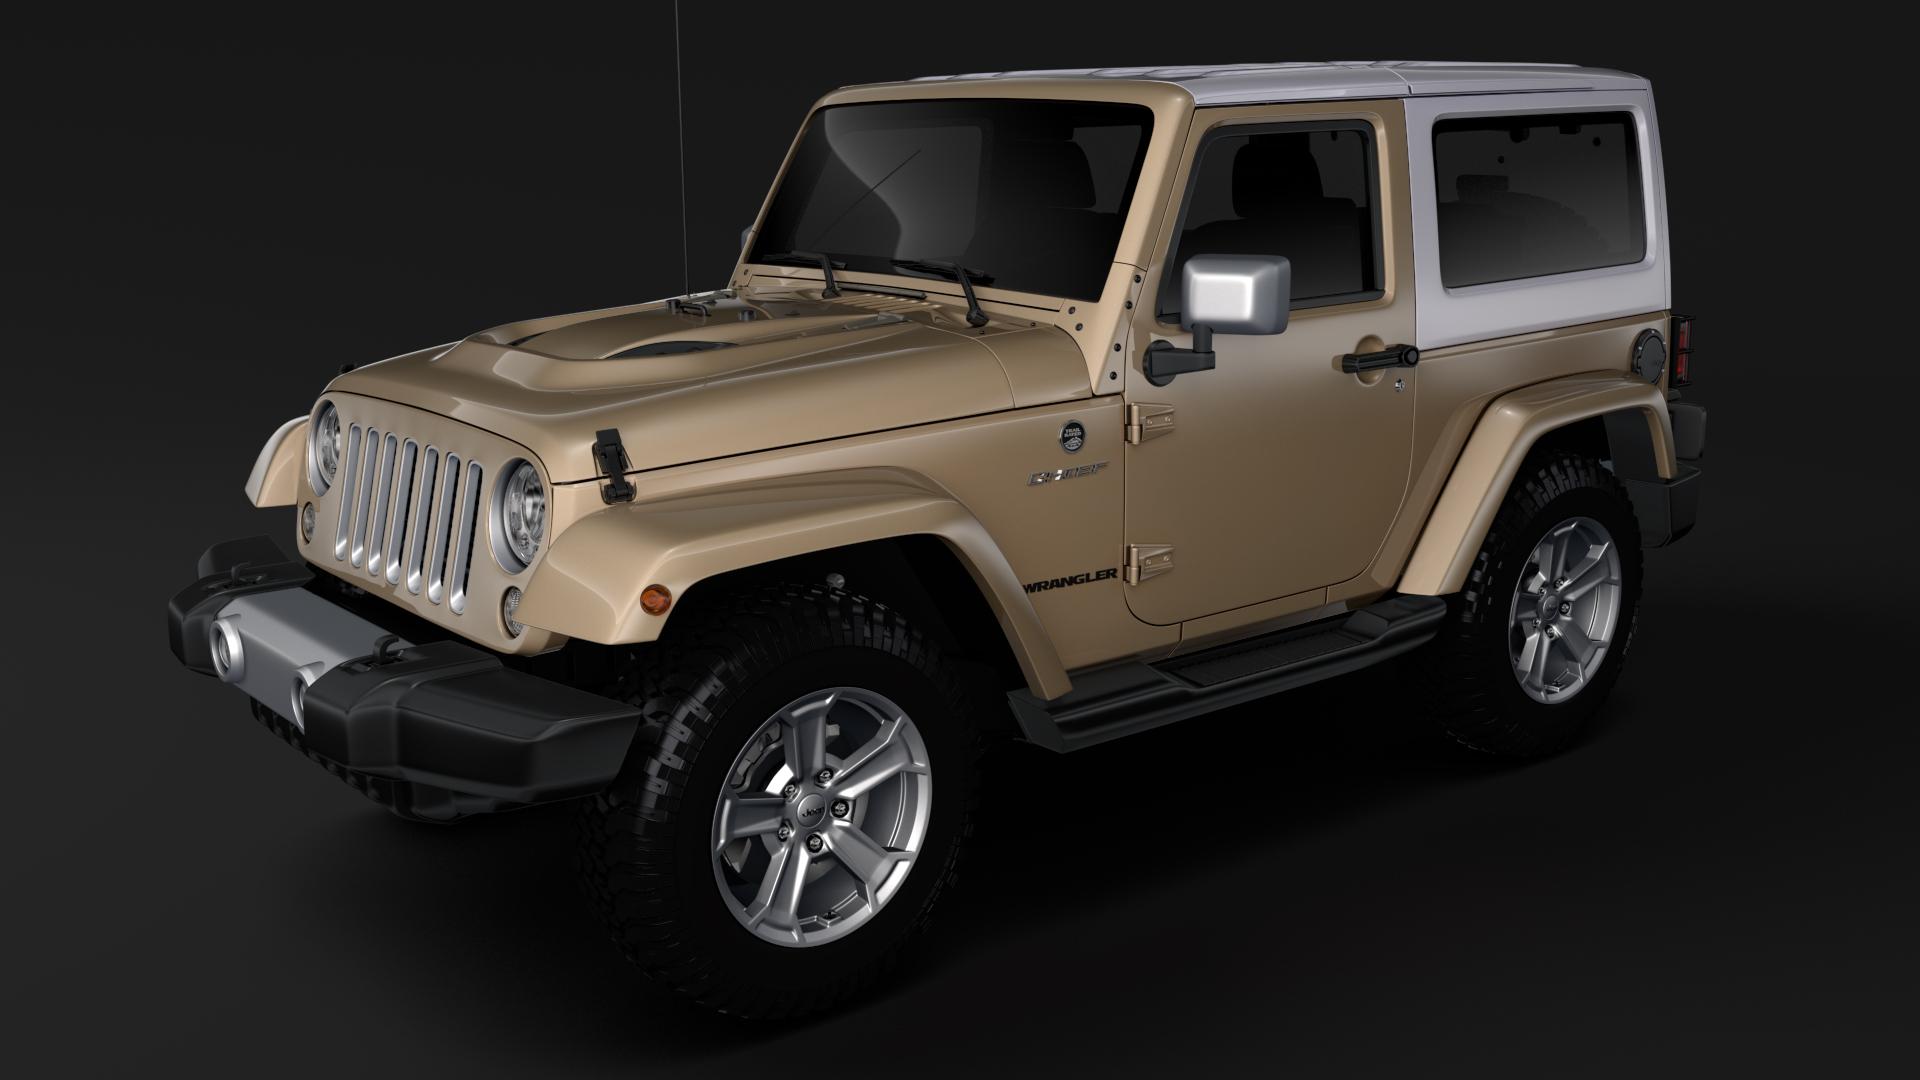 jeep wrangler chief jk 2017 3d model max fbx c4d lwo ma mb hrc xsi obj 276876